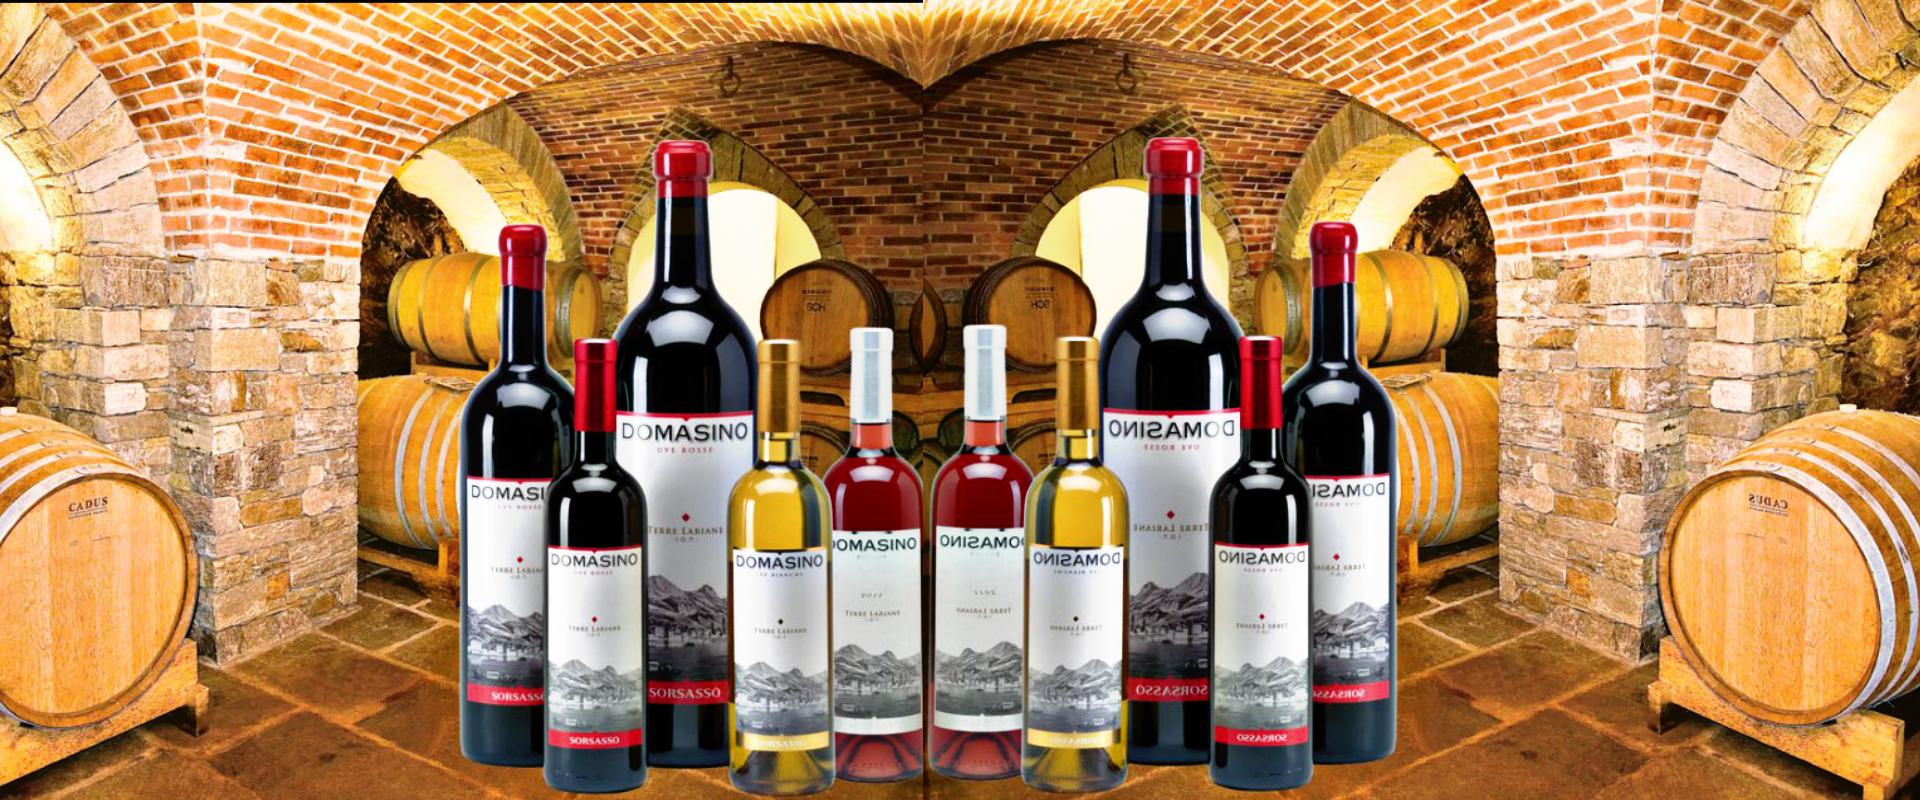 produttori_vino_rosso_azienda_sorsasso_italyeatfood.png